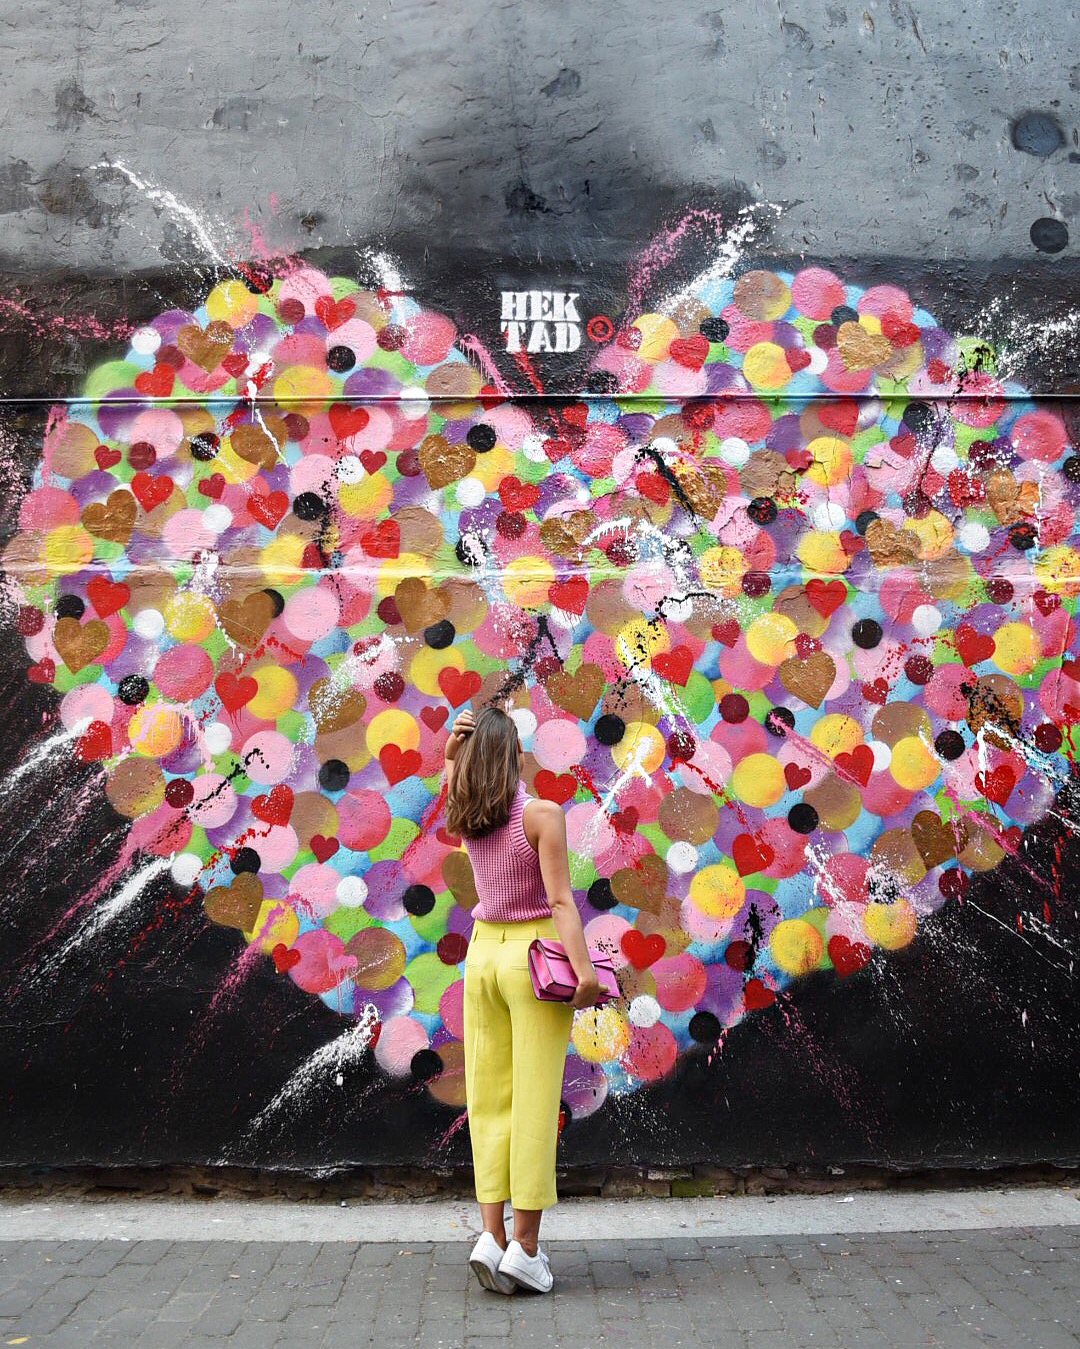 heart-art-wall-blogger-fashiioncarpet-new-york